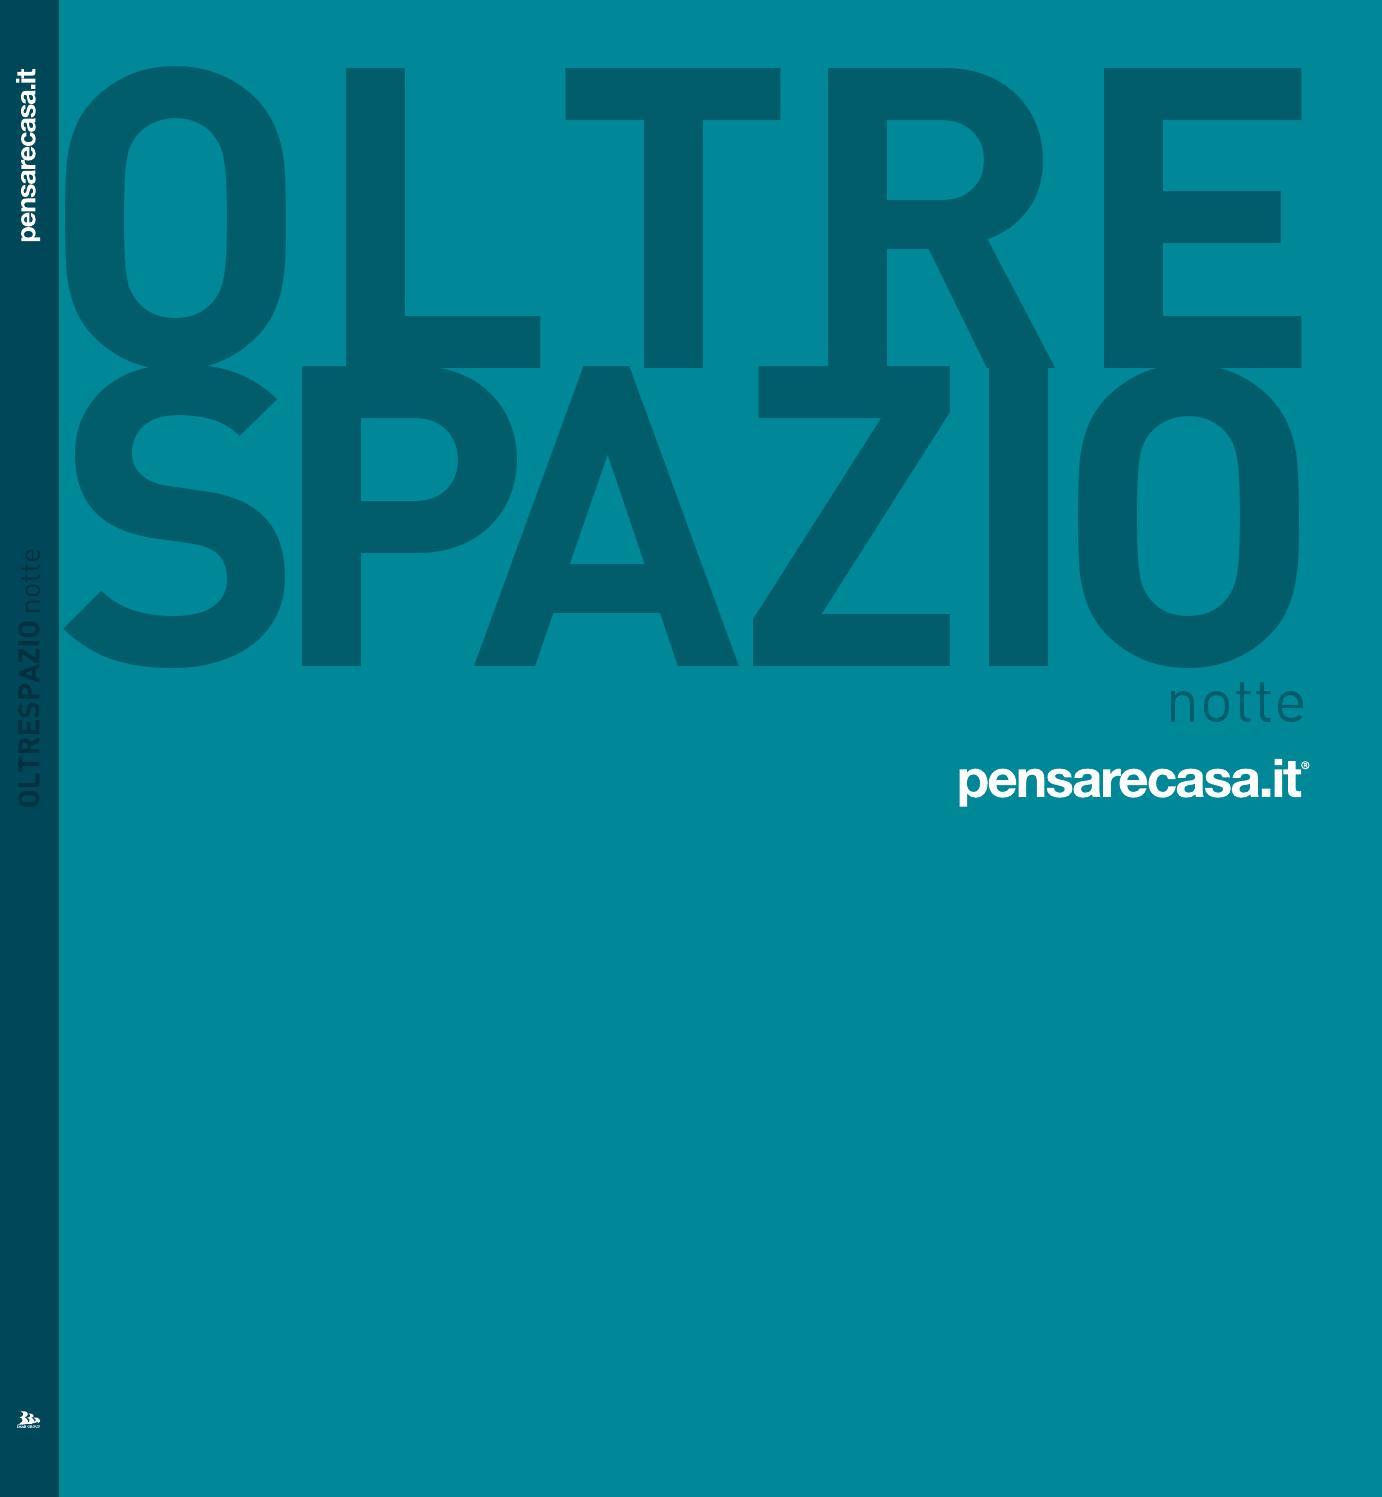 IMAB group - Oltrespazio notte by Grazia Mobili - issuu